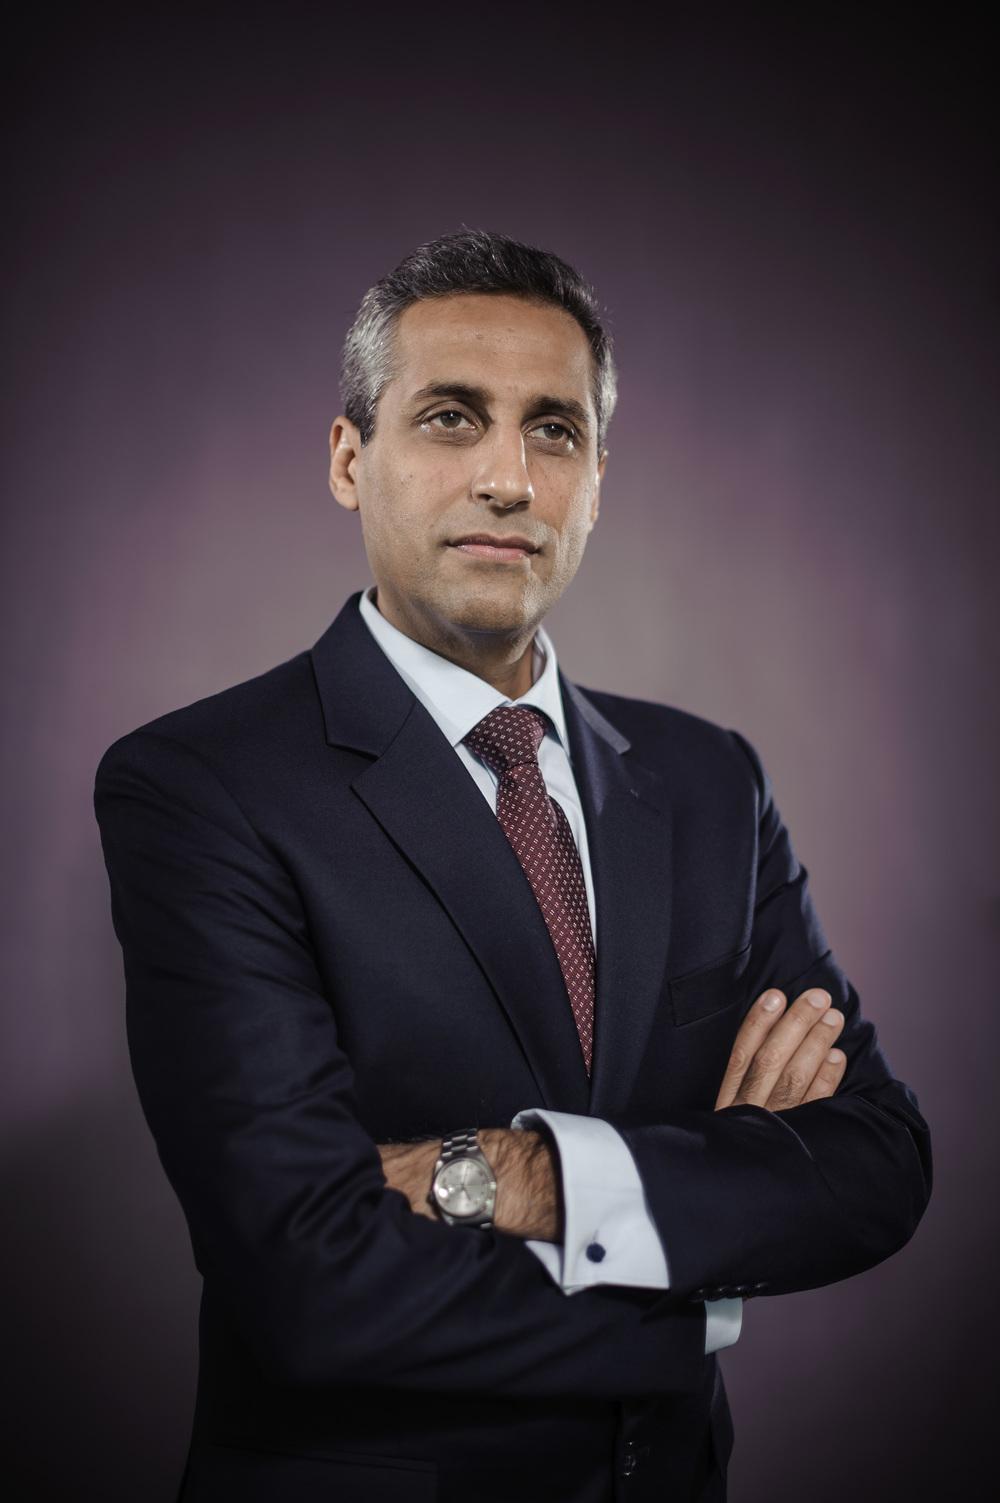 Barclays_CFO_Portraits-46.jpg